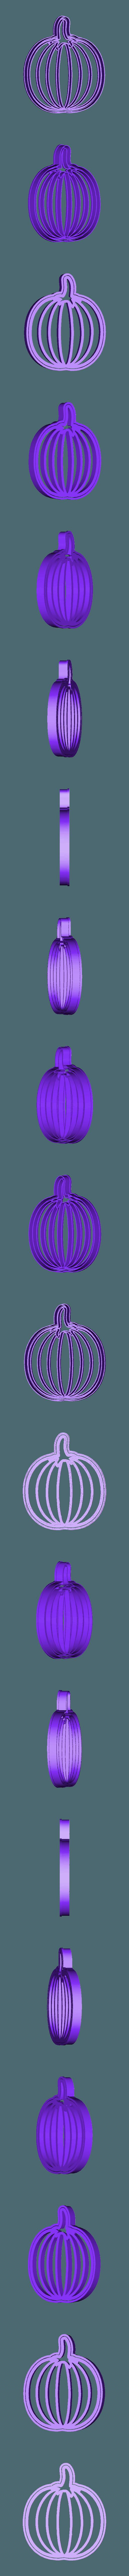 4.stl Télécharger fichier STL gratuit PACK CHAUSSURES ET CHAUSSURES - SCEAUX ECHANGEABLES - CHAUSSURES HALLOWEEN CUTTING - FONDANT MASS CUTTING AND pumpkin CLAY - 8 AND 10cm • Objet imprimable en 3D, Agos3D